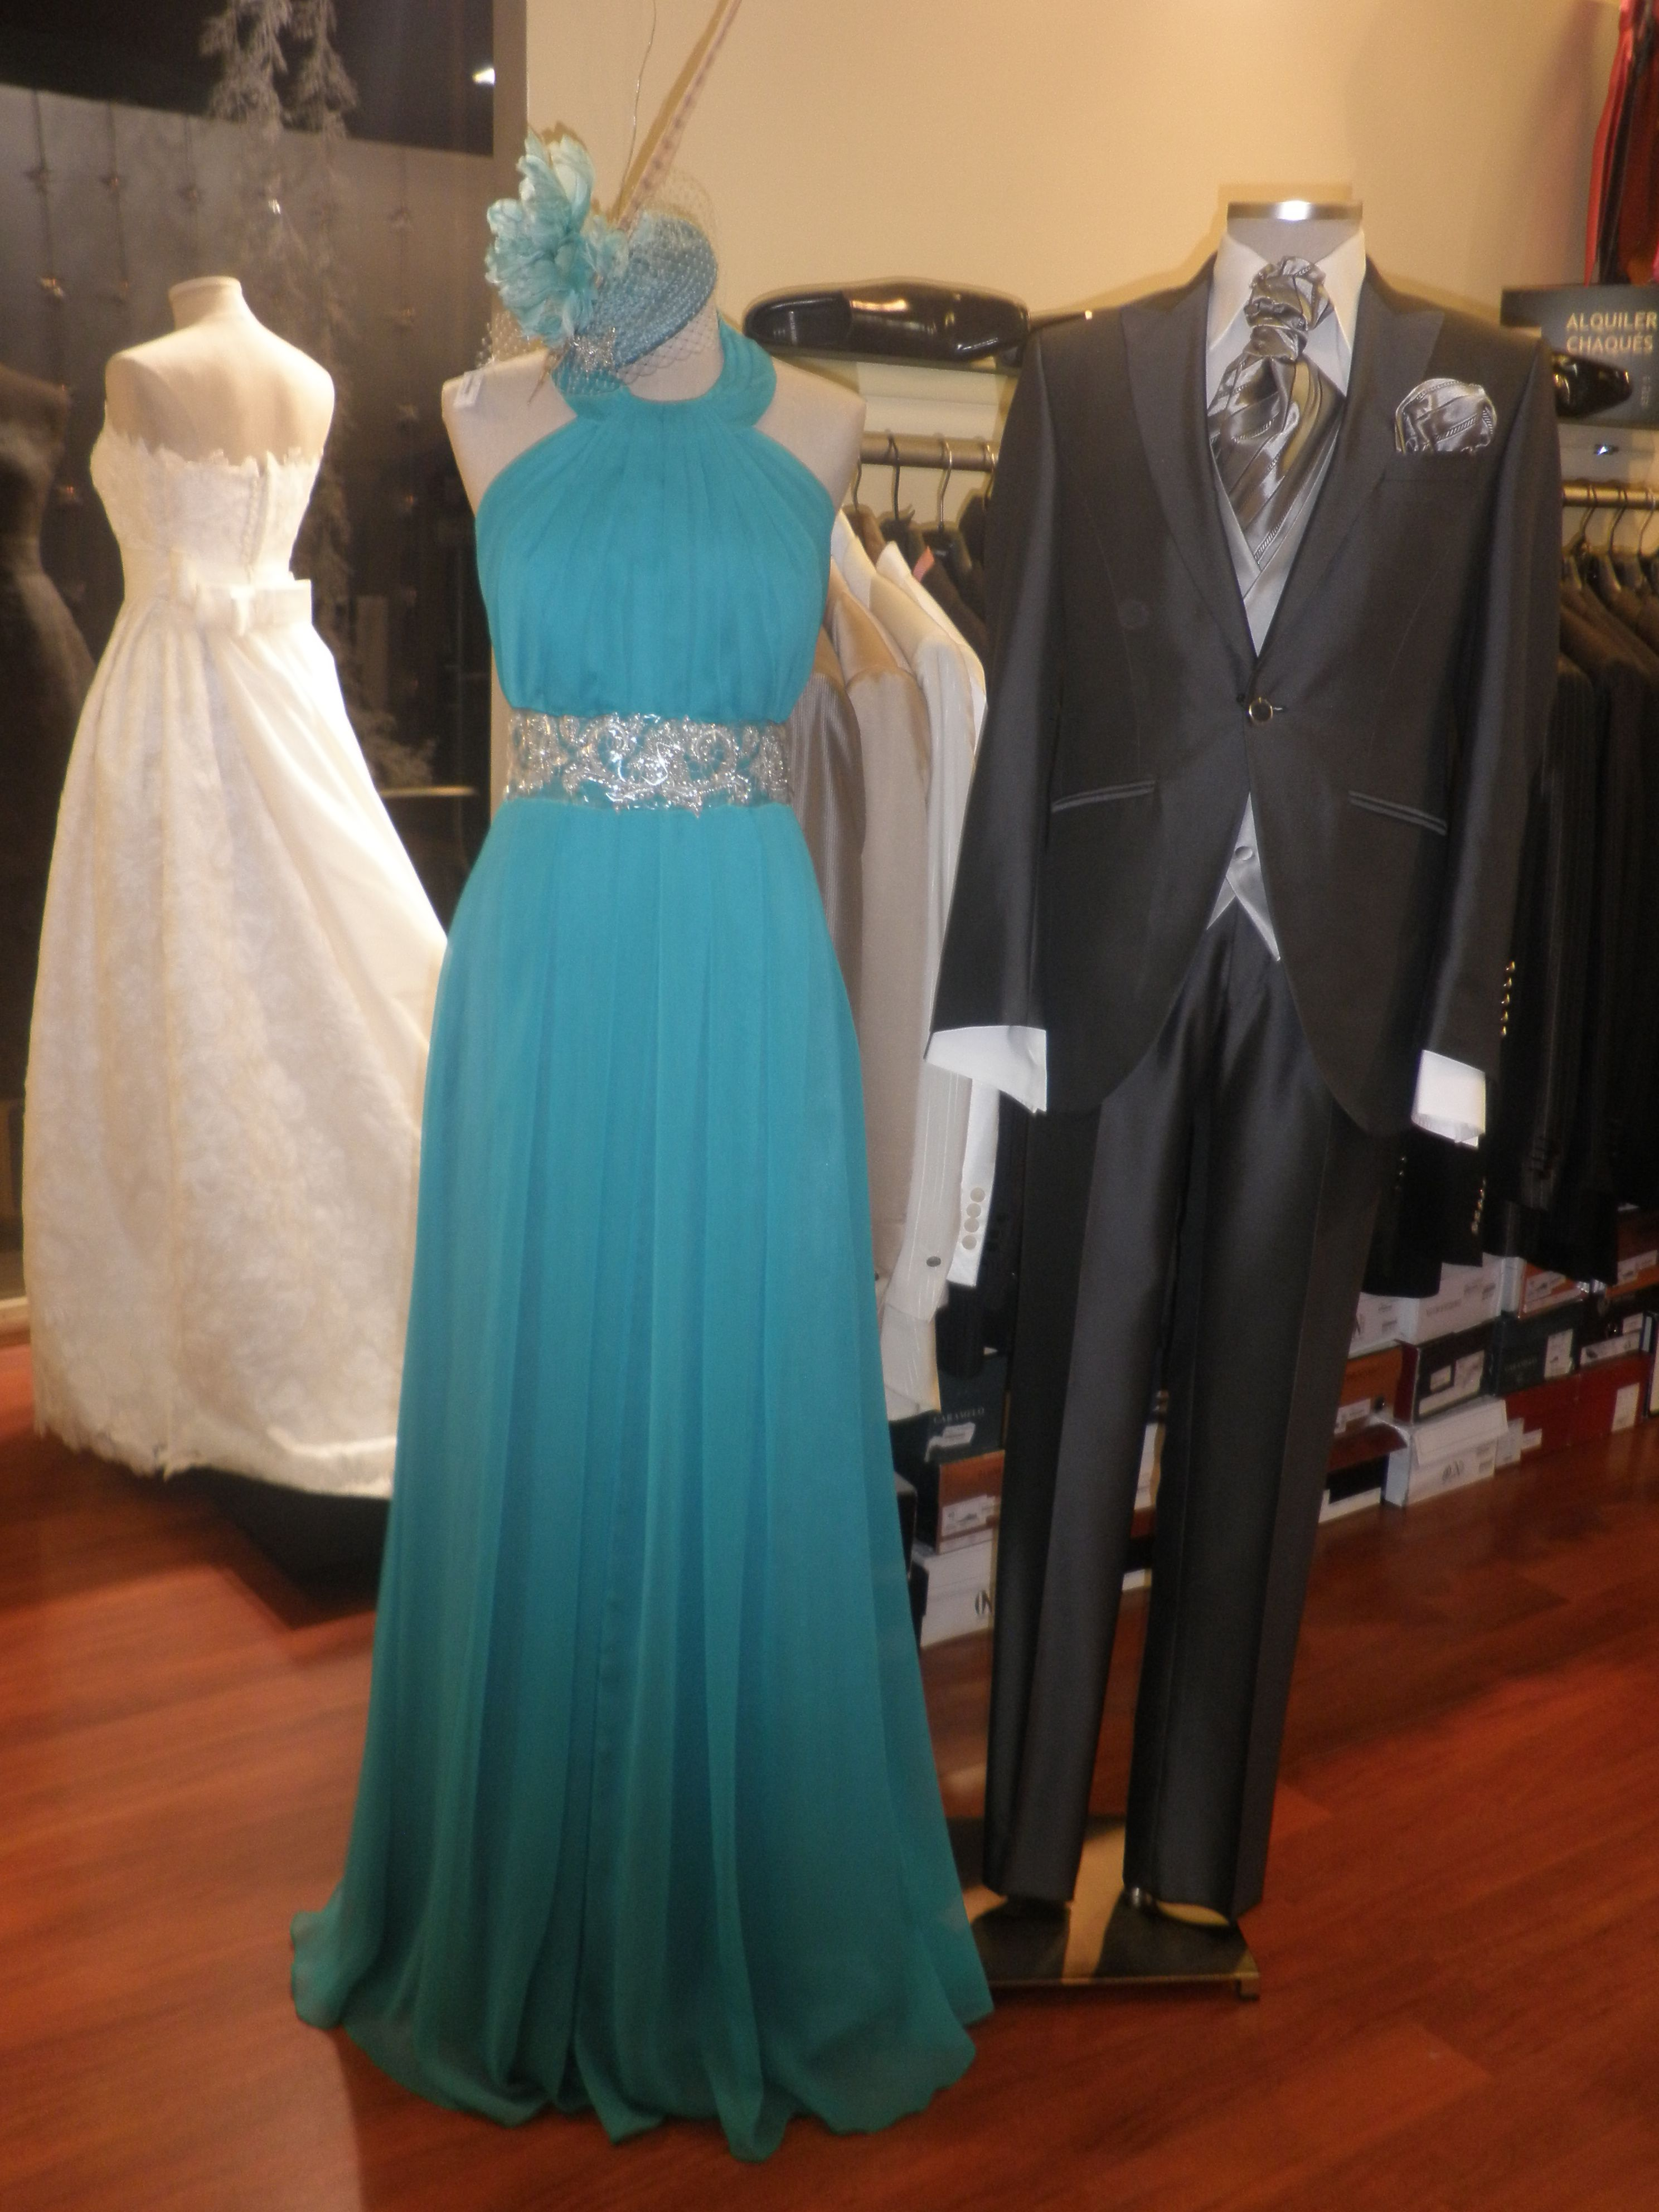 Vestido #Fiesta Couture; #Traje cro Eduardo Bosch de Serrano ...